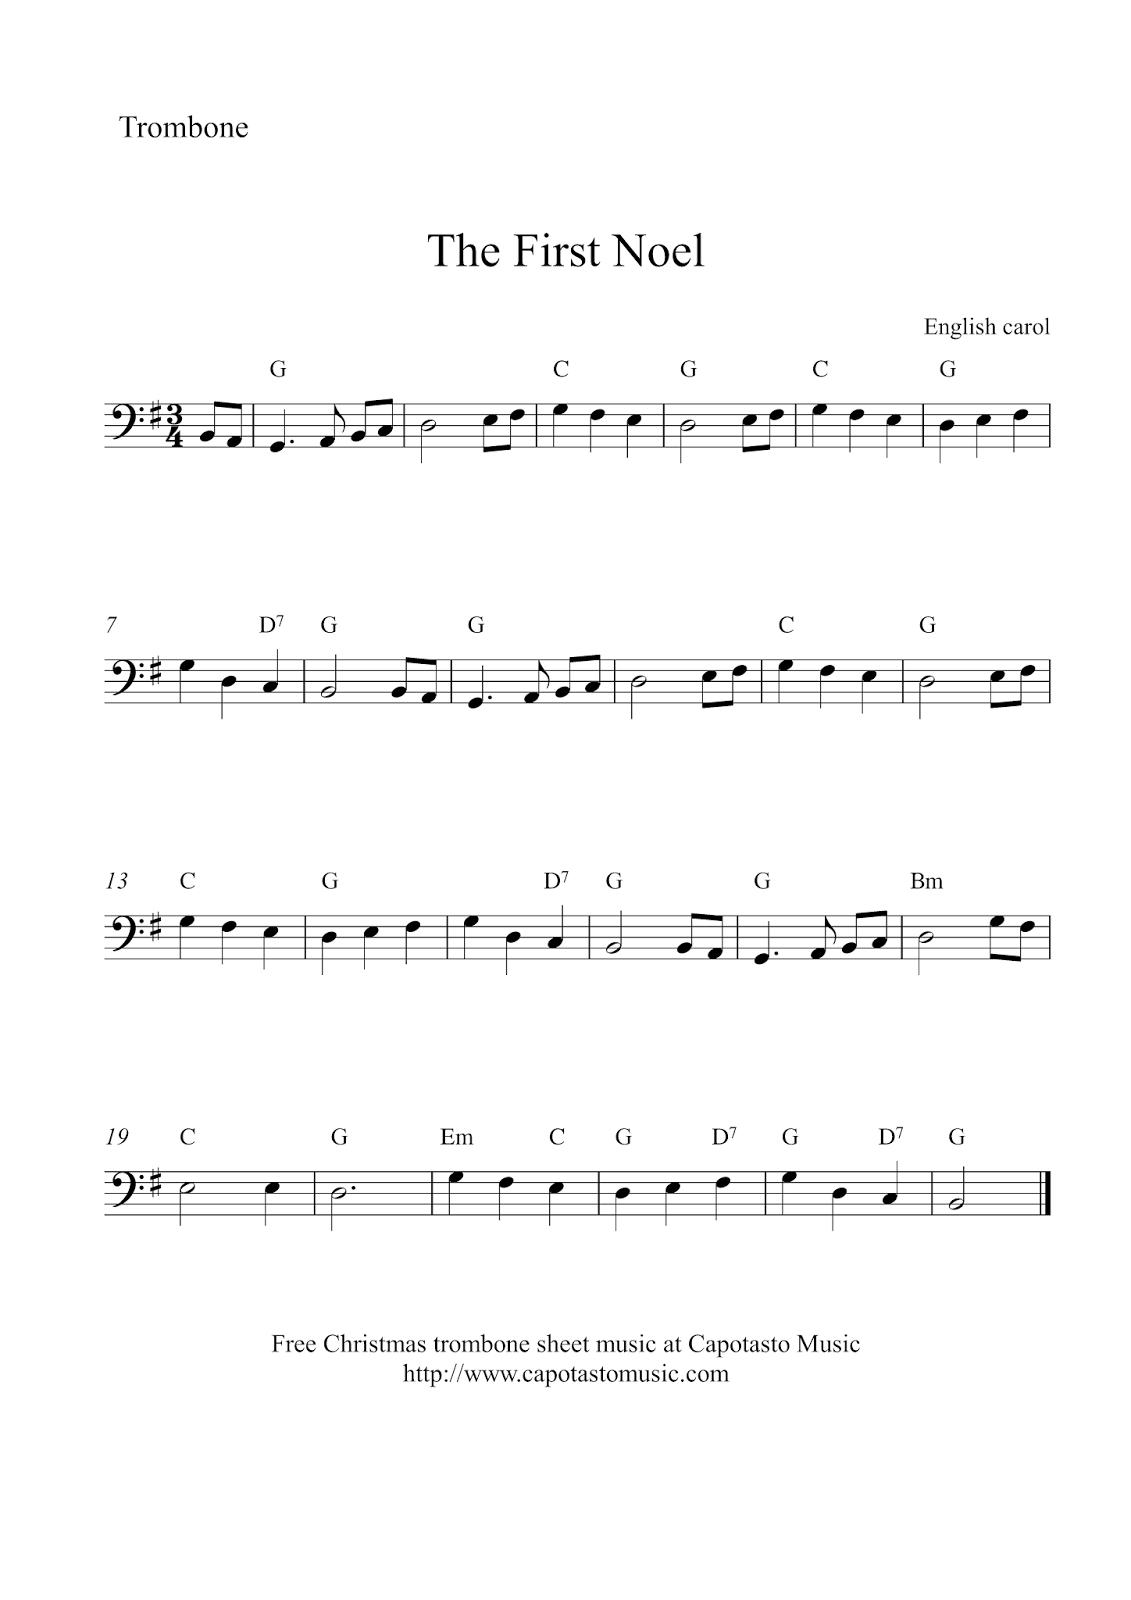 photo regarding Free Printable Trombone Sheet Music identified as No cost Xmas Trombone Sheet Audio - The 1st Noel